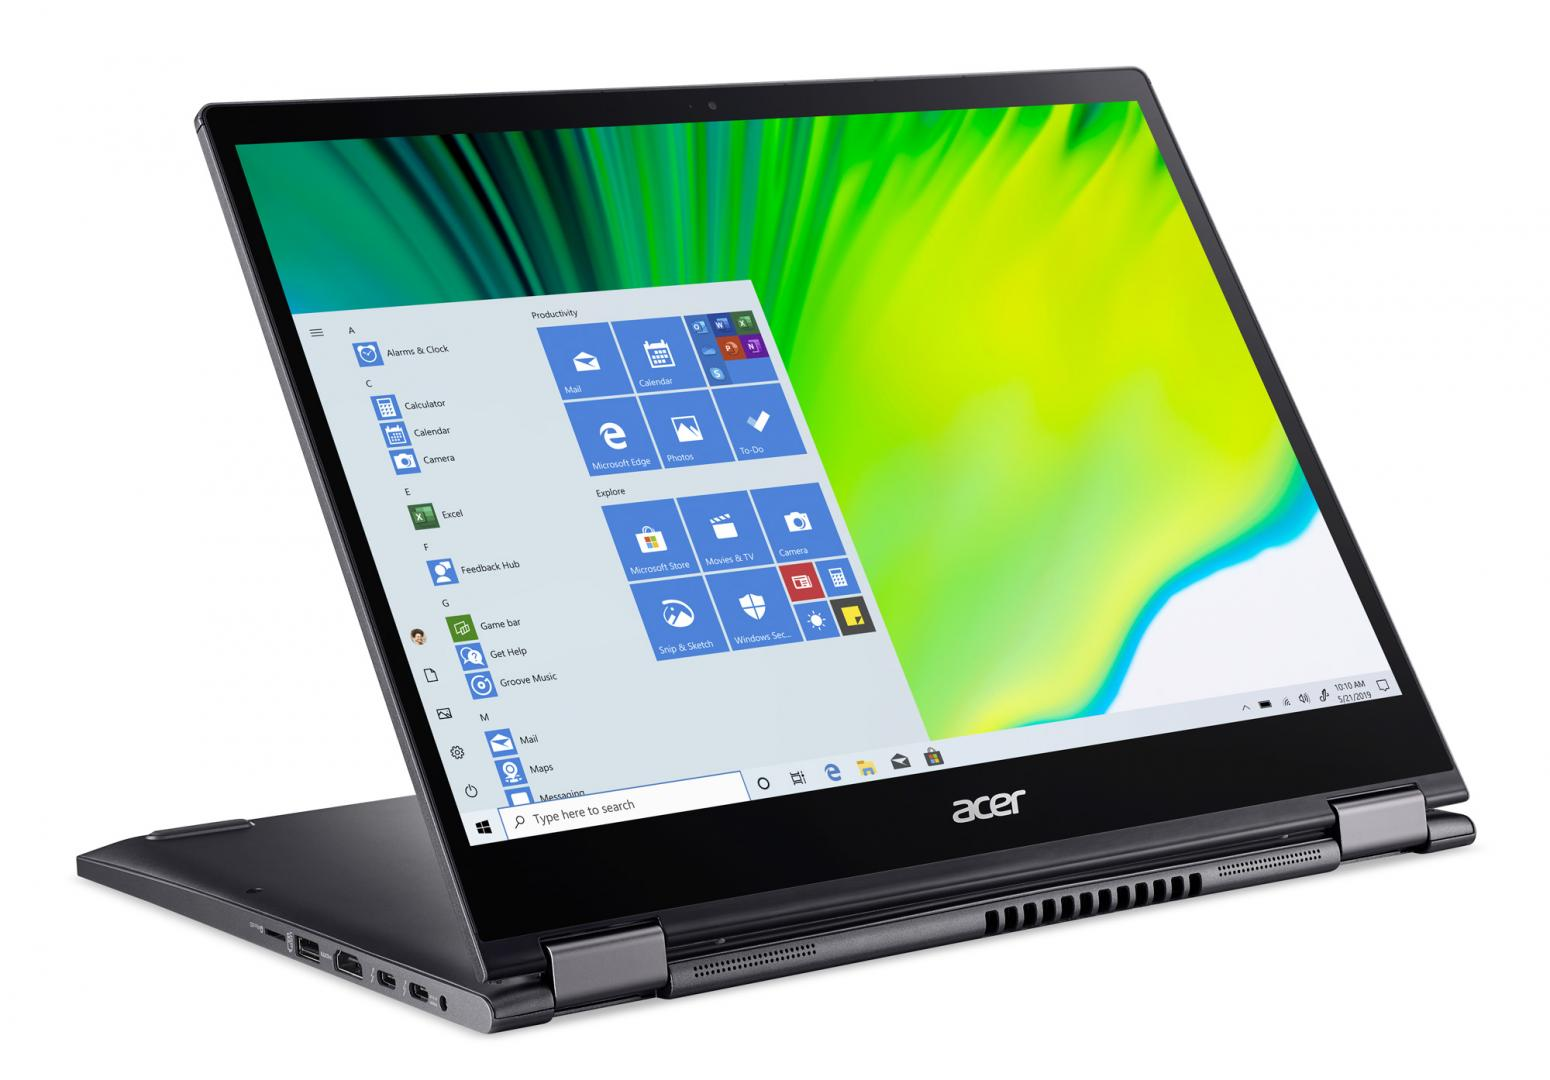 Ordinateur portable Acer Spin 5 SP513-54N-59ED Gris - QHD Tactile, Stylet - photo 2